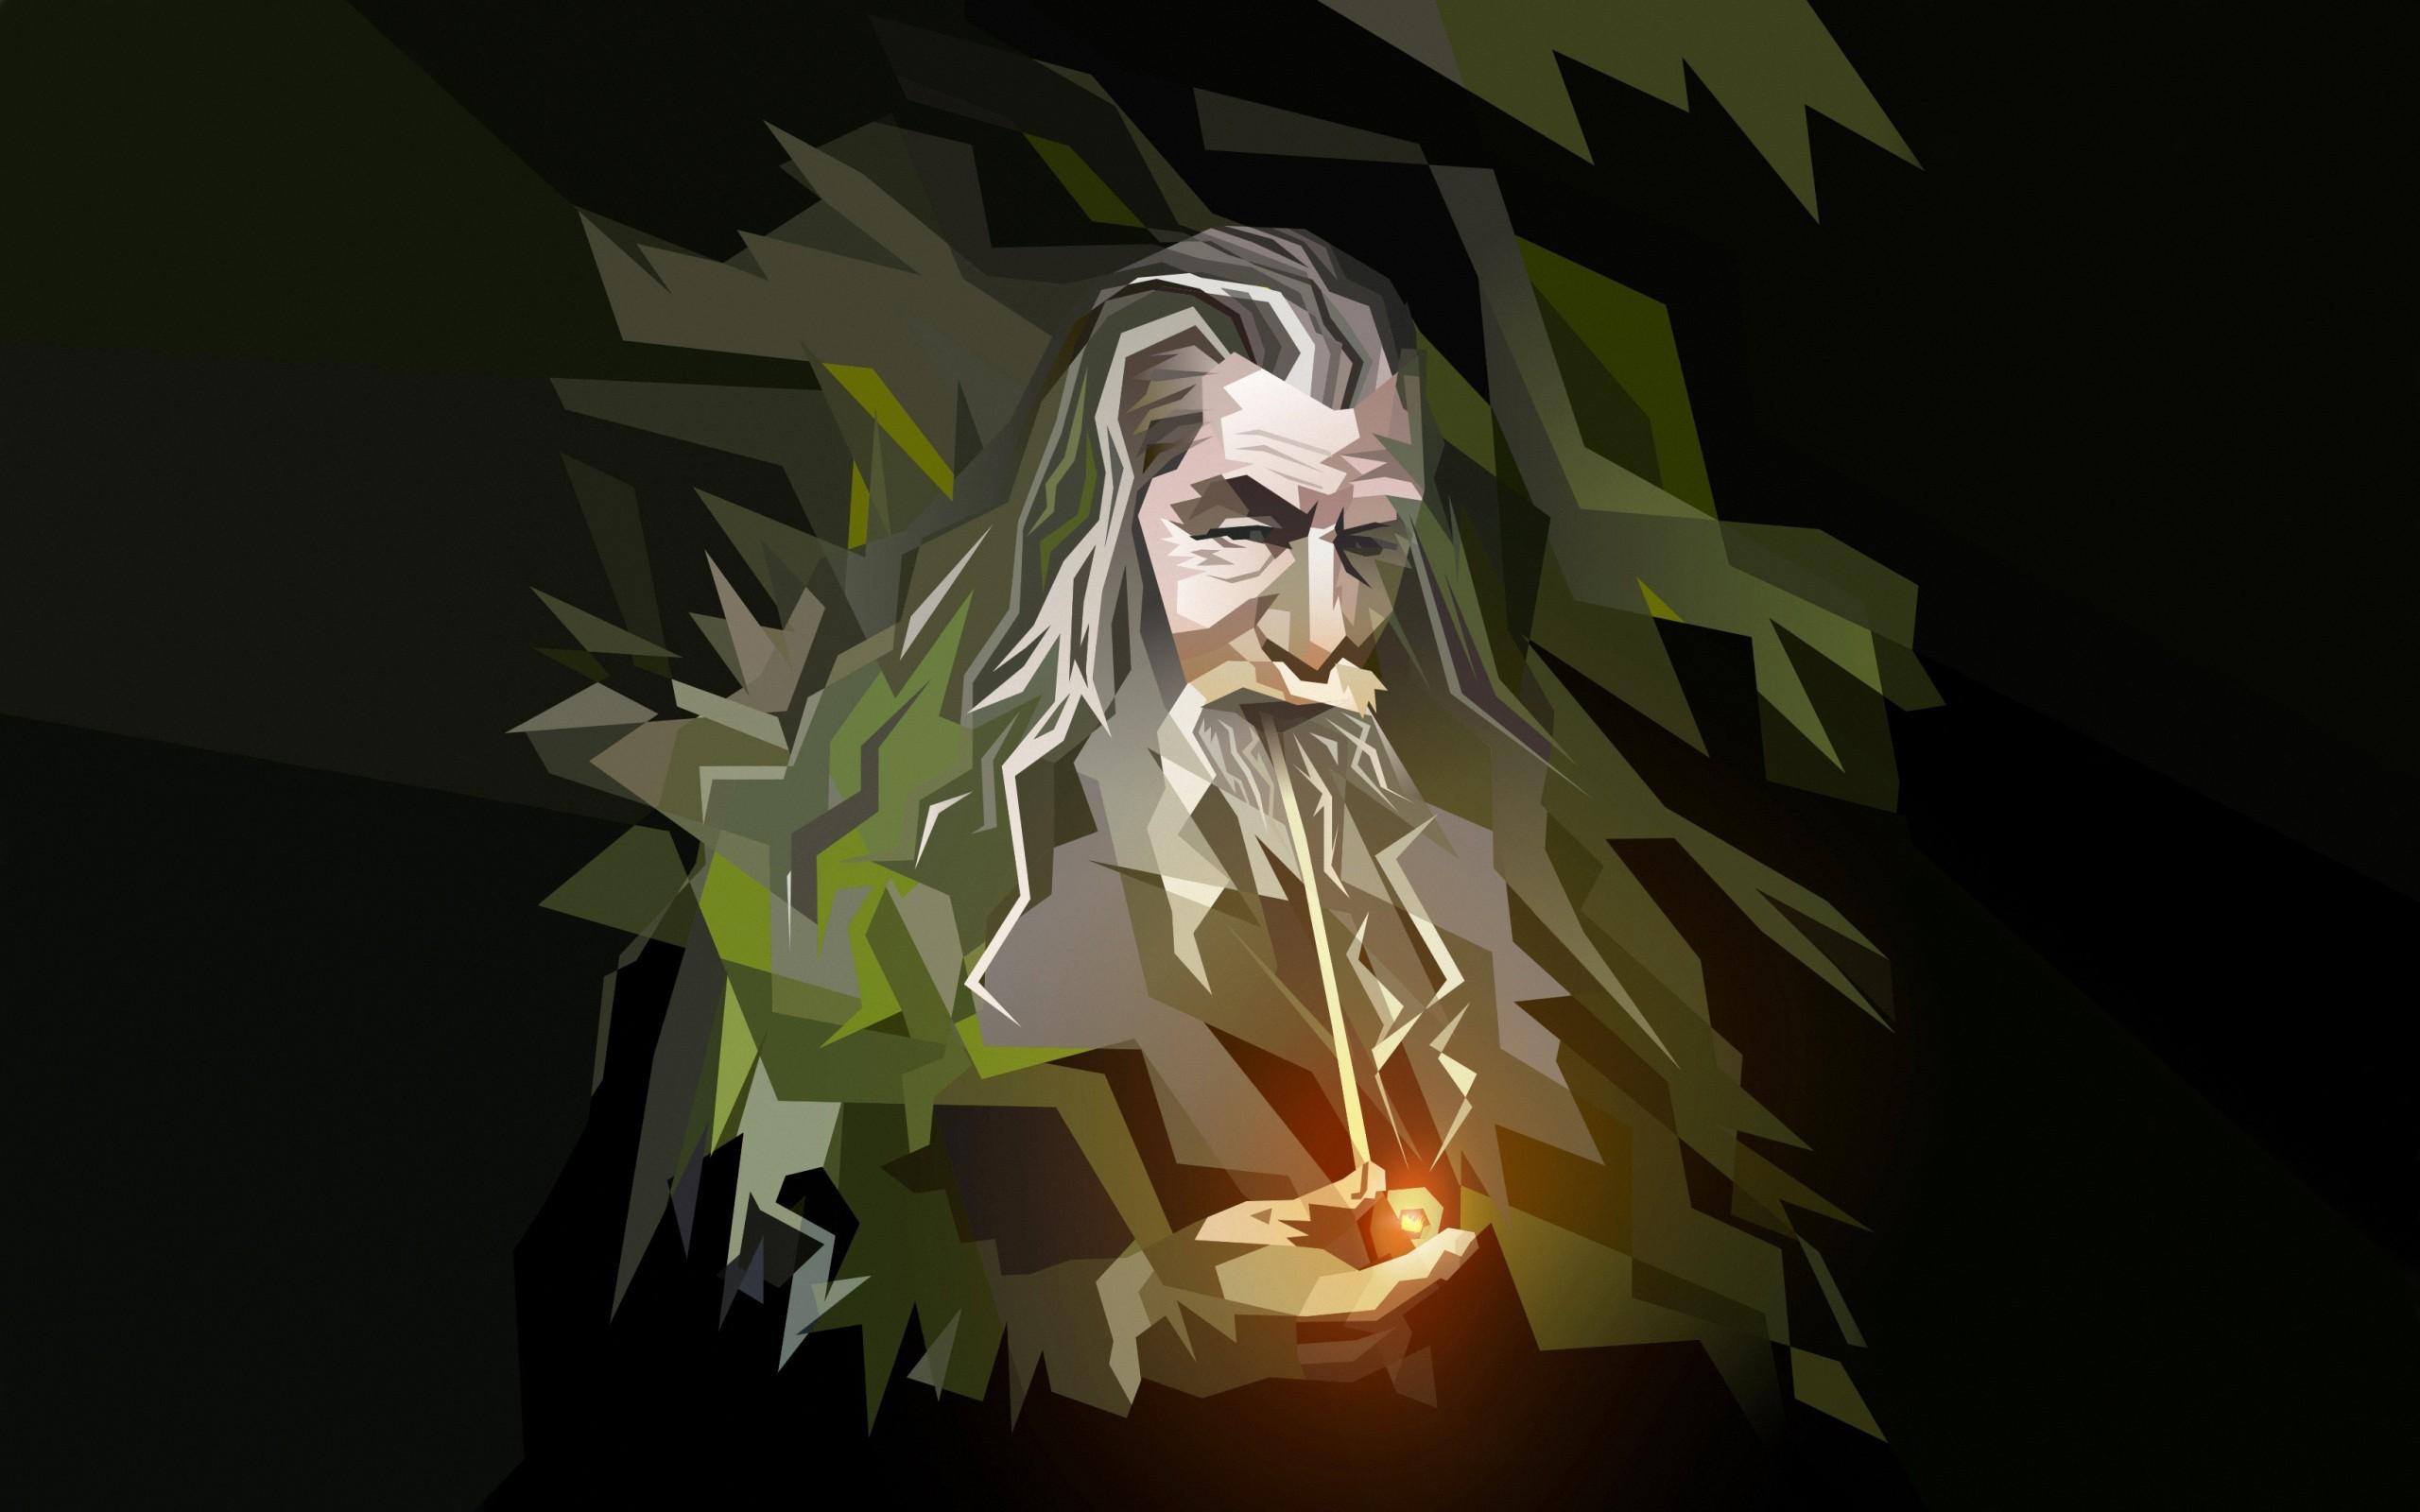 hobbit wallpaper iphone 6 plus